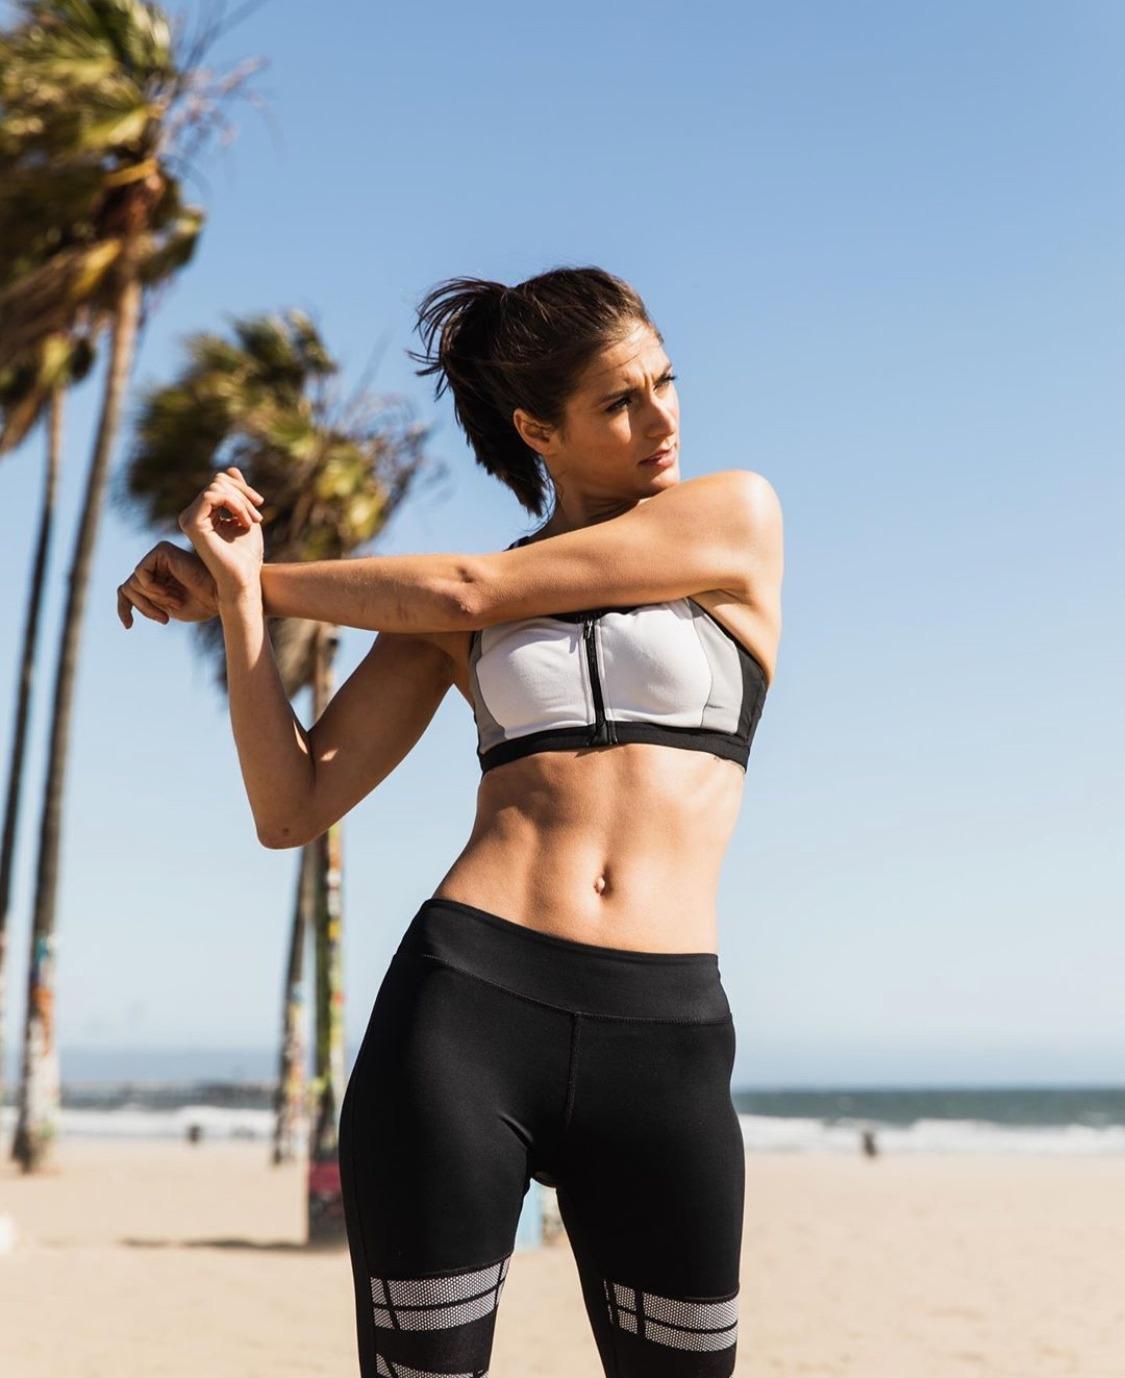 Beach Fitness Shoot